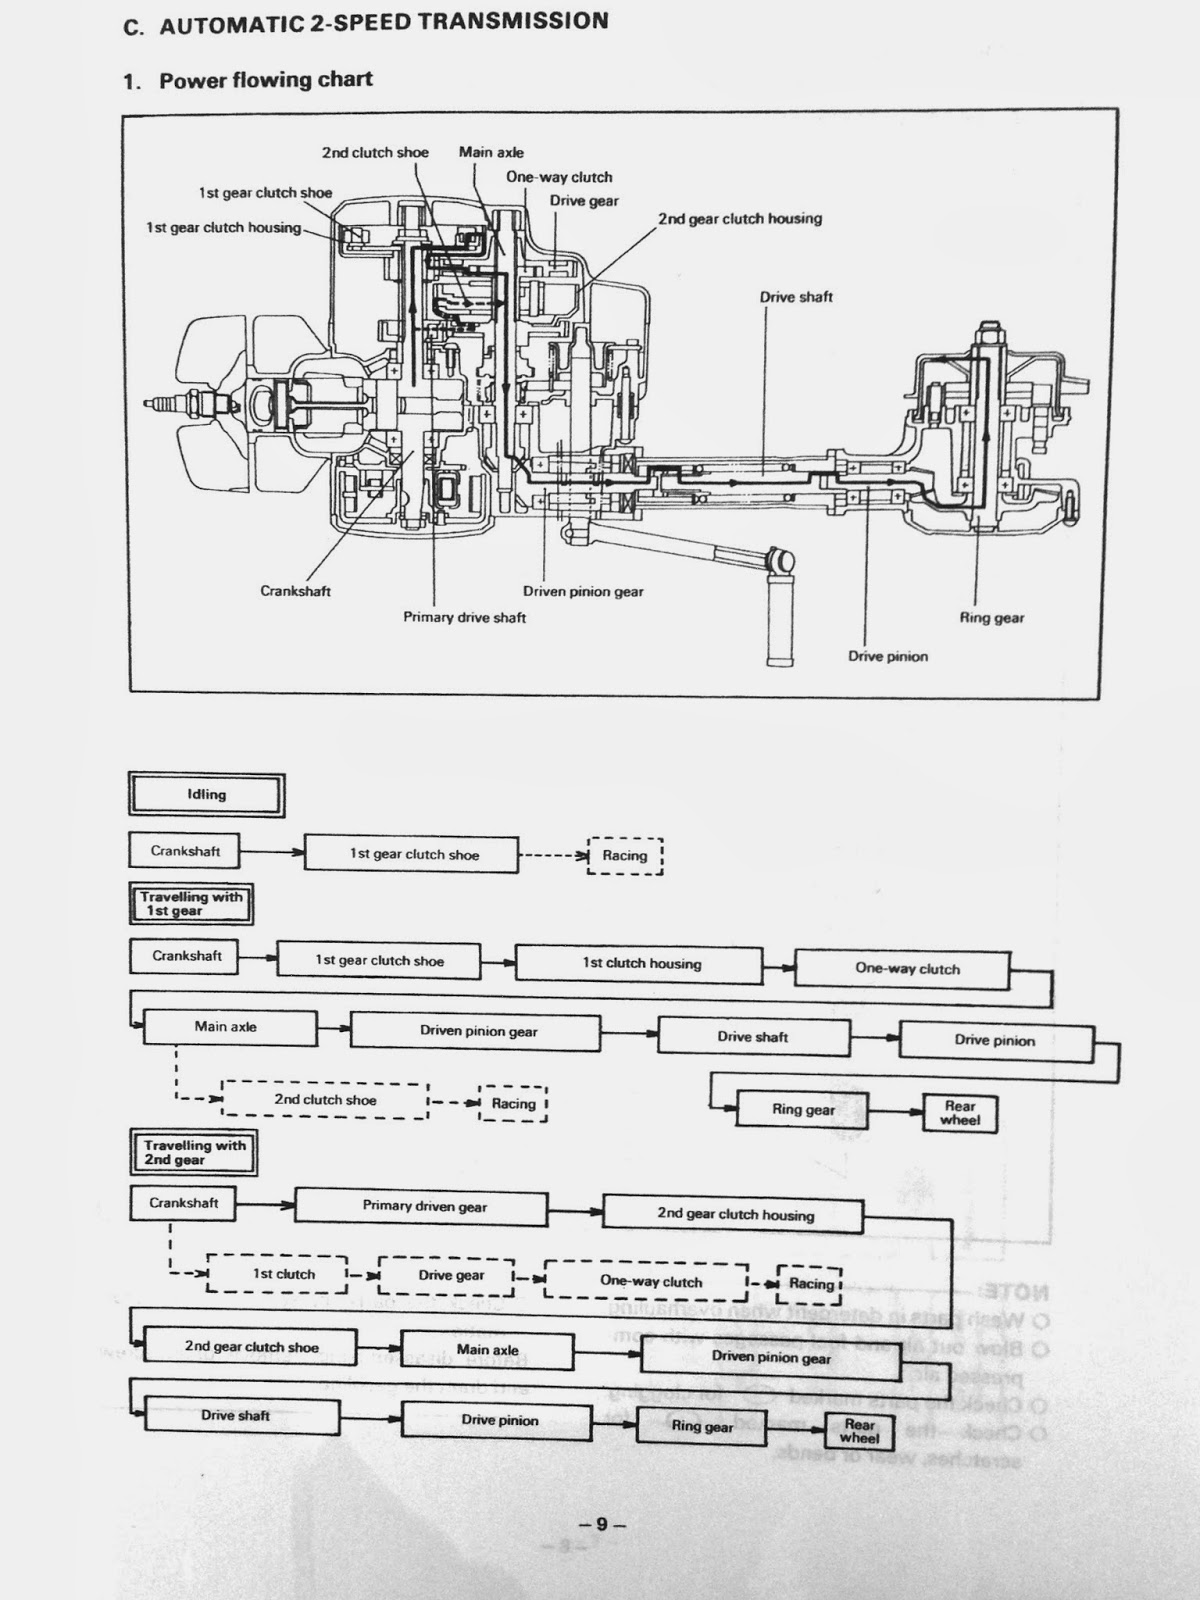 lc 50 service manual in  jpg format